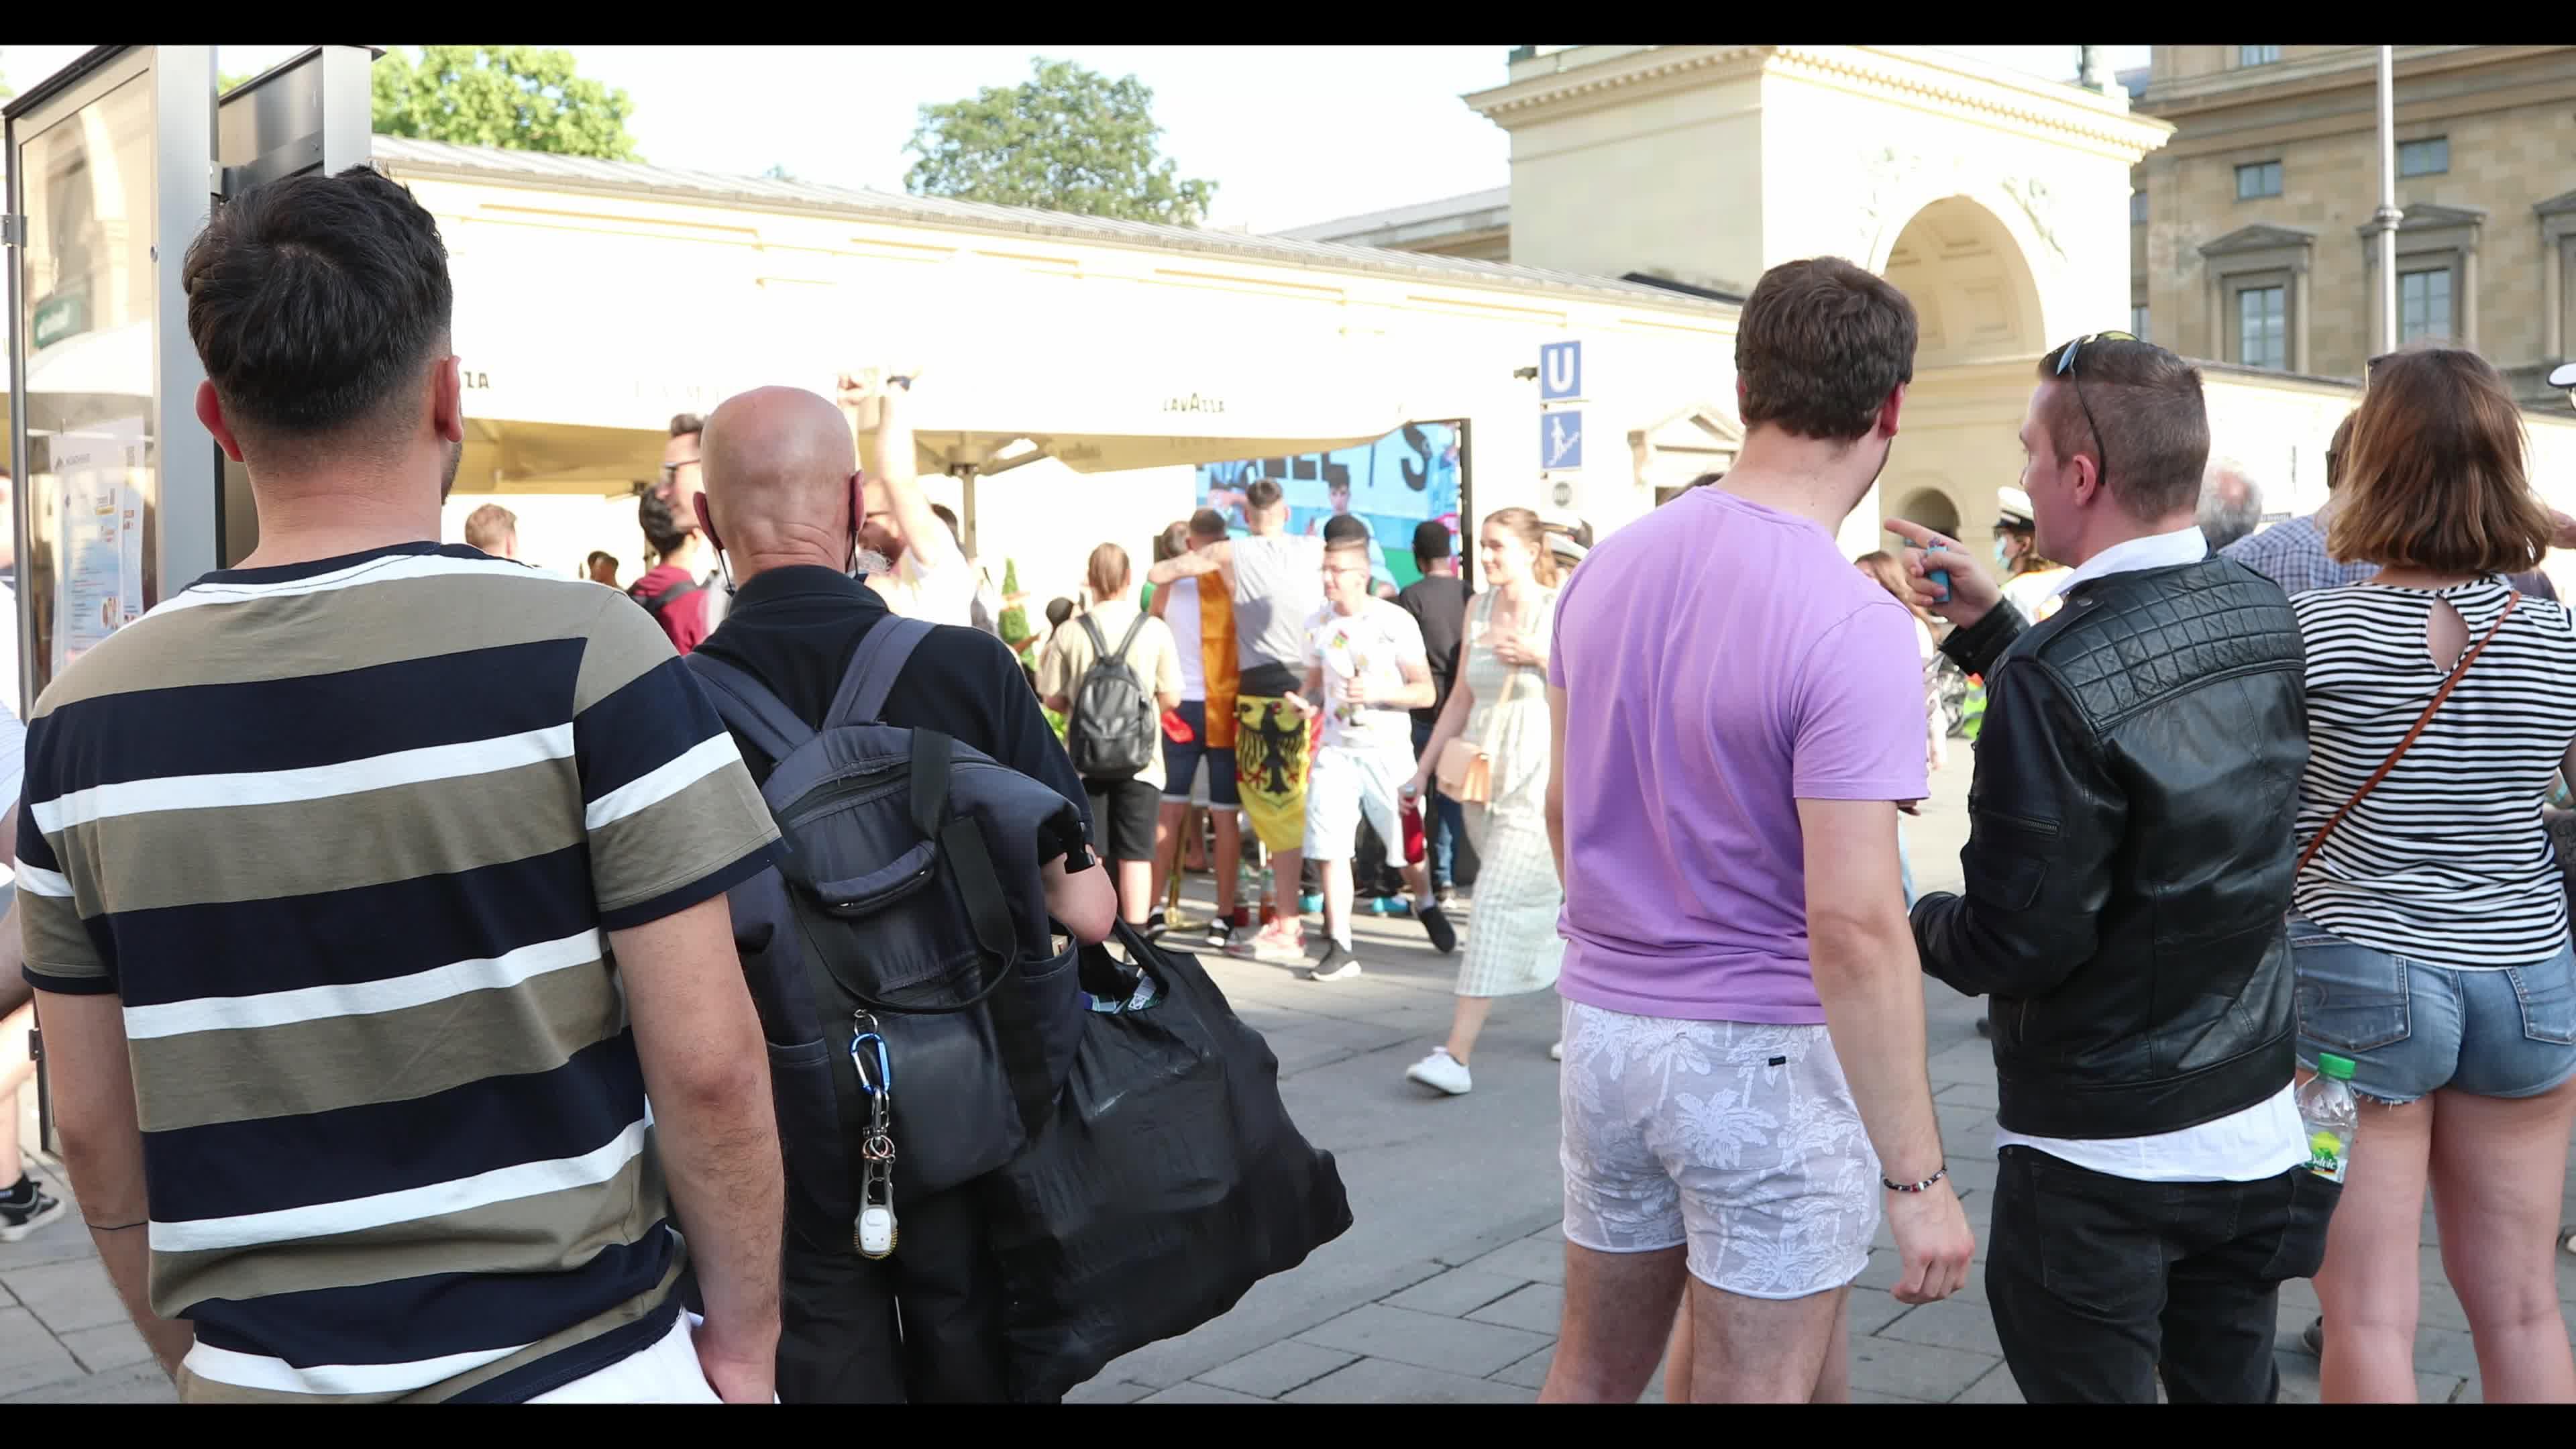 Football fans watch Euro 2020 match Germany – Portugal in Munich